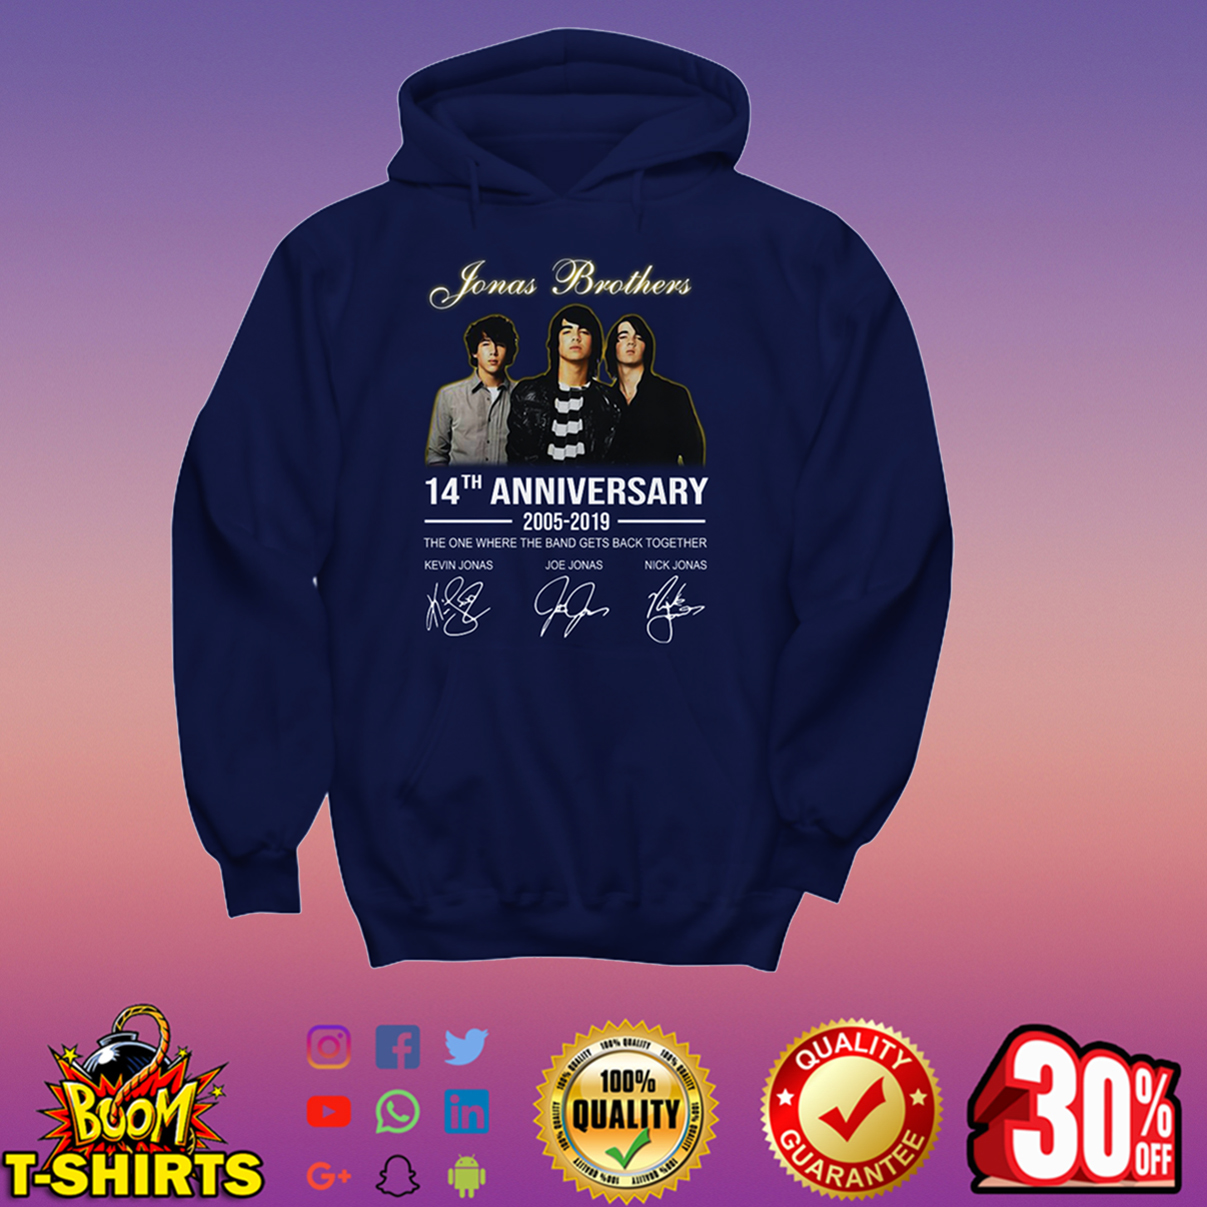 Jonas Brothers 14th anniversary 2005-2019 signature hoodie